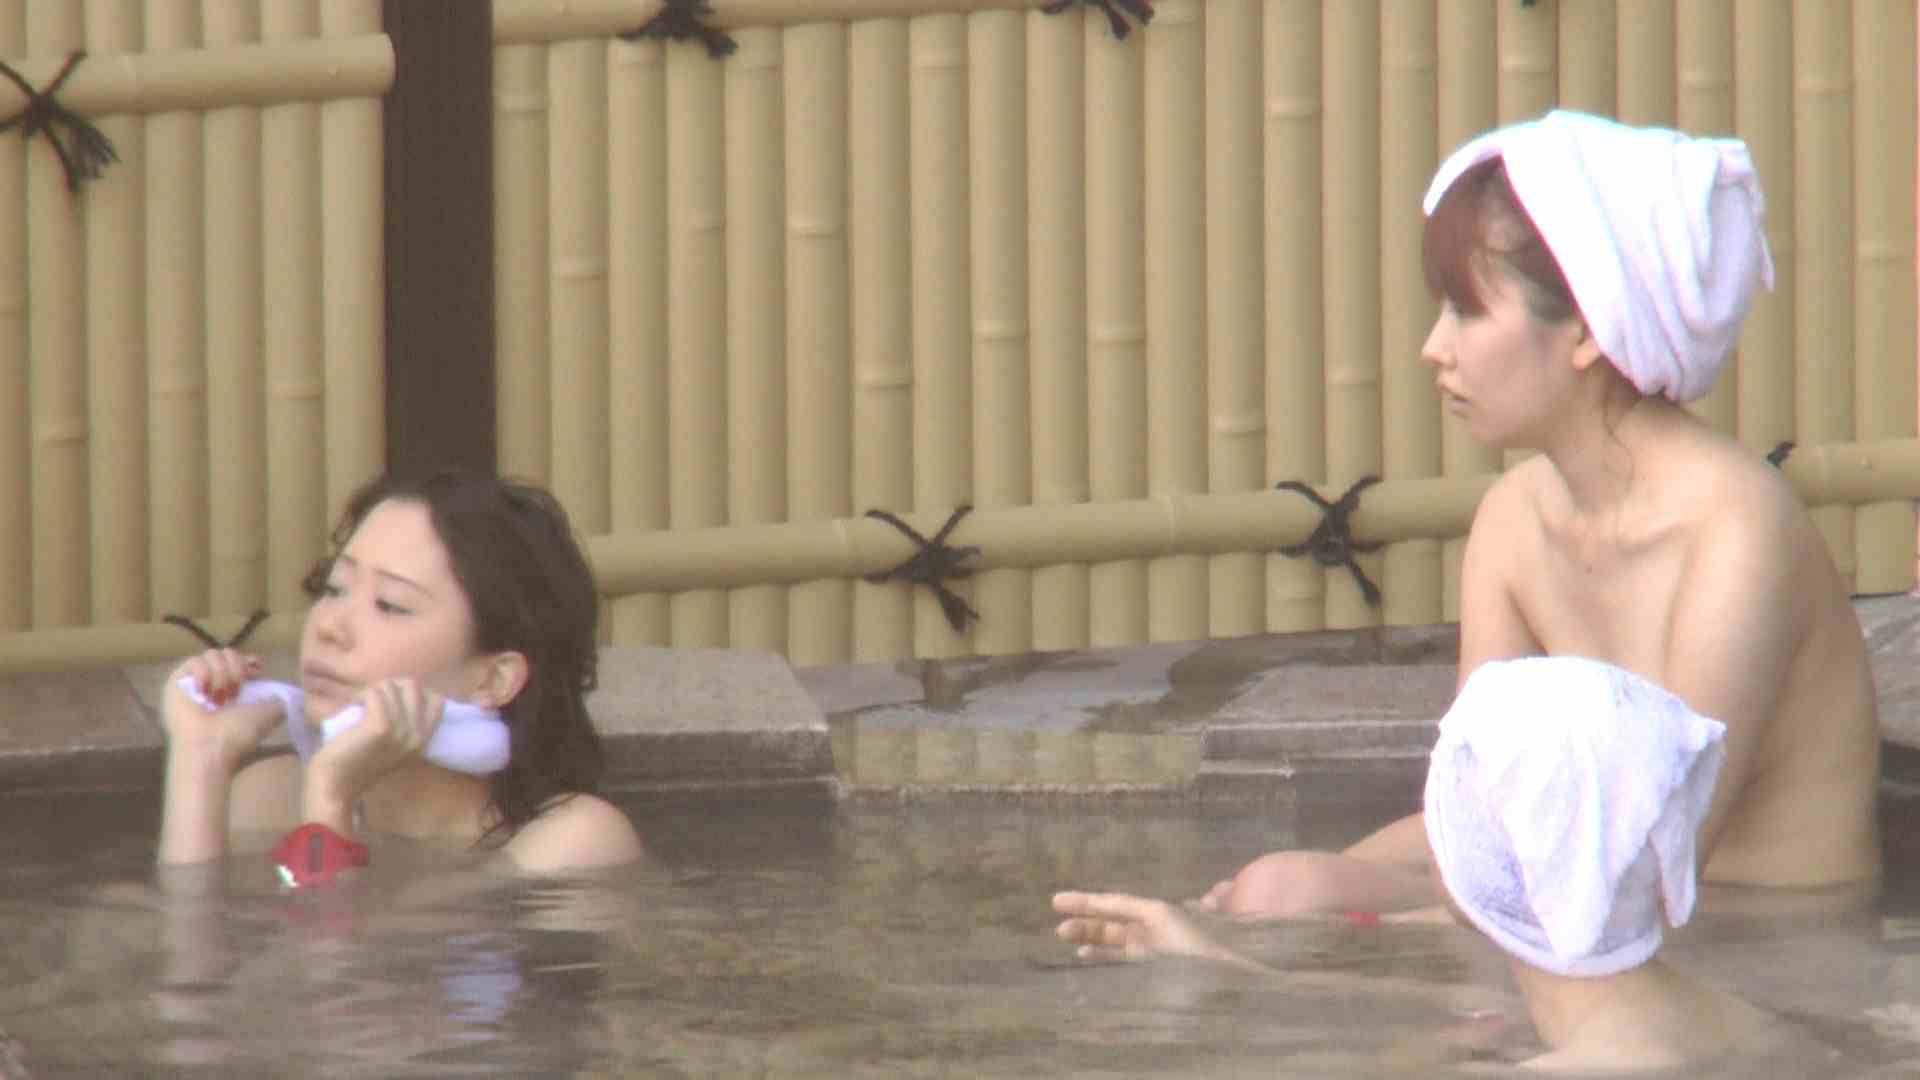 Aquaな露天風呂Vol.211 OLセックス 盗撮アダルト動画キャプチャ 68画像 29